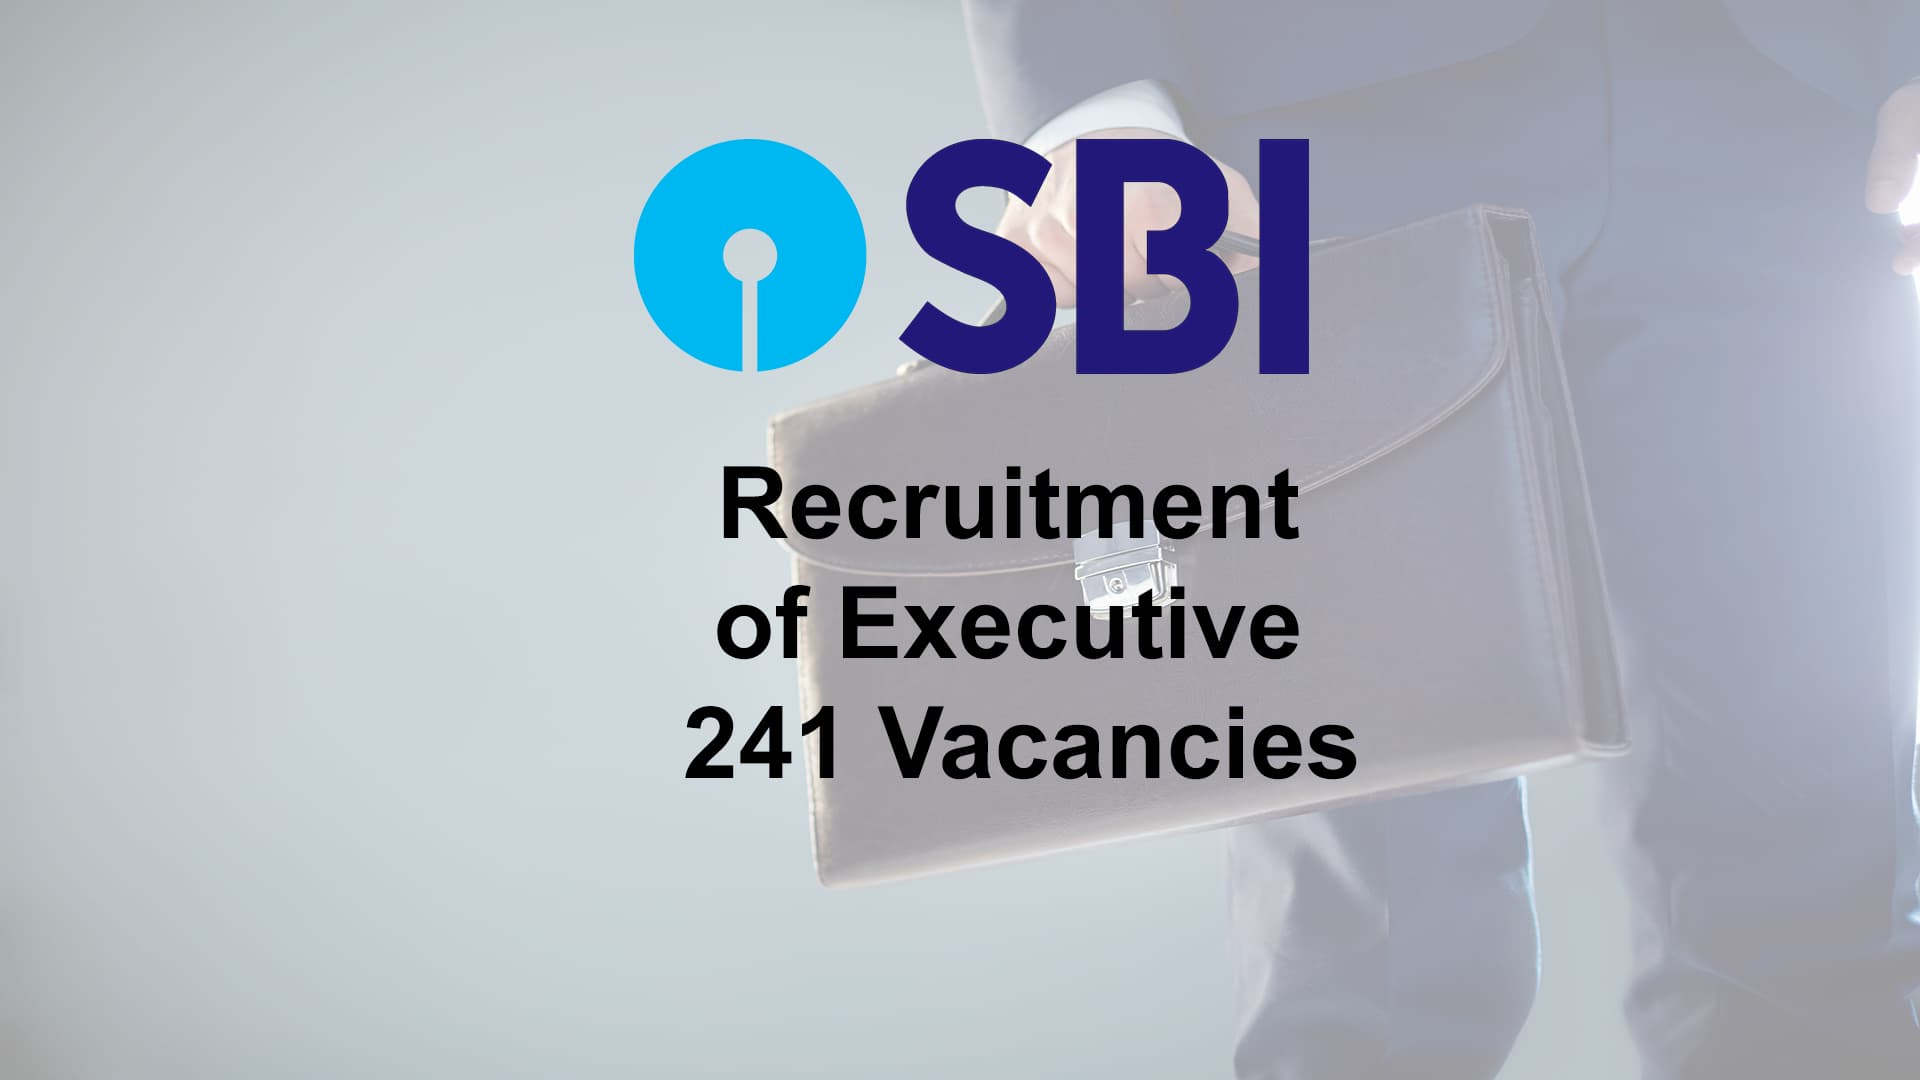 SBI Recruitment of Executive 241 Vacancies